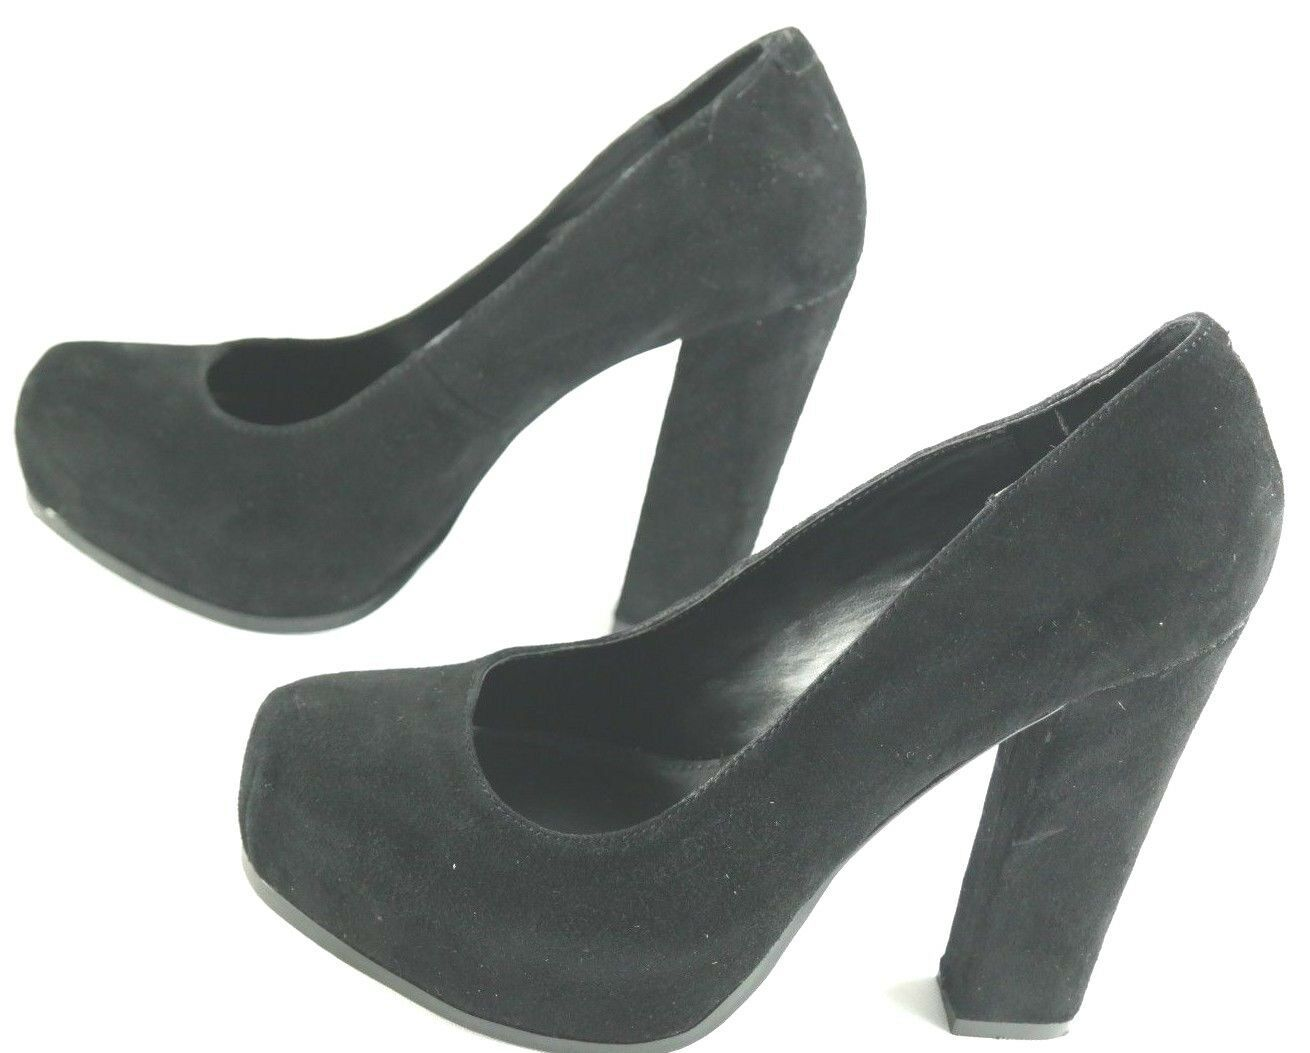 Steve Madden Sarrina Platform Pumps Womens Sz 7.5 Black Suede High Heel Shoes image 2